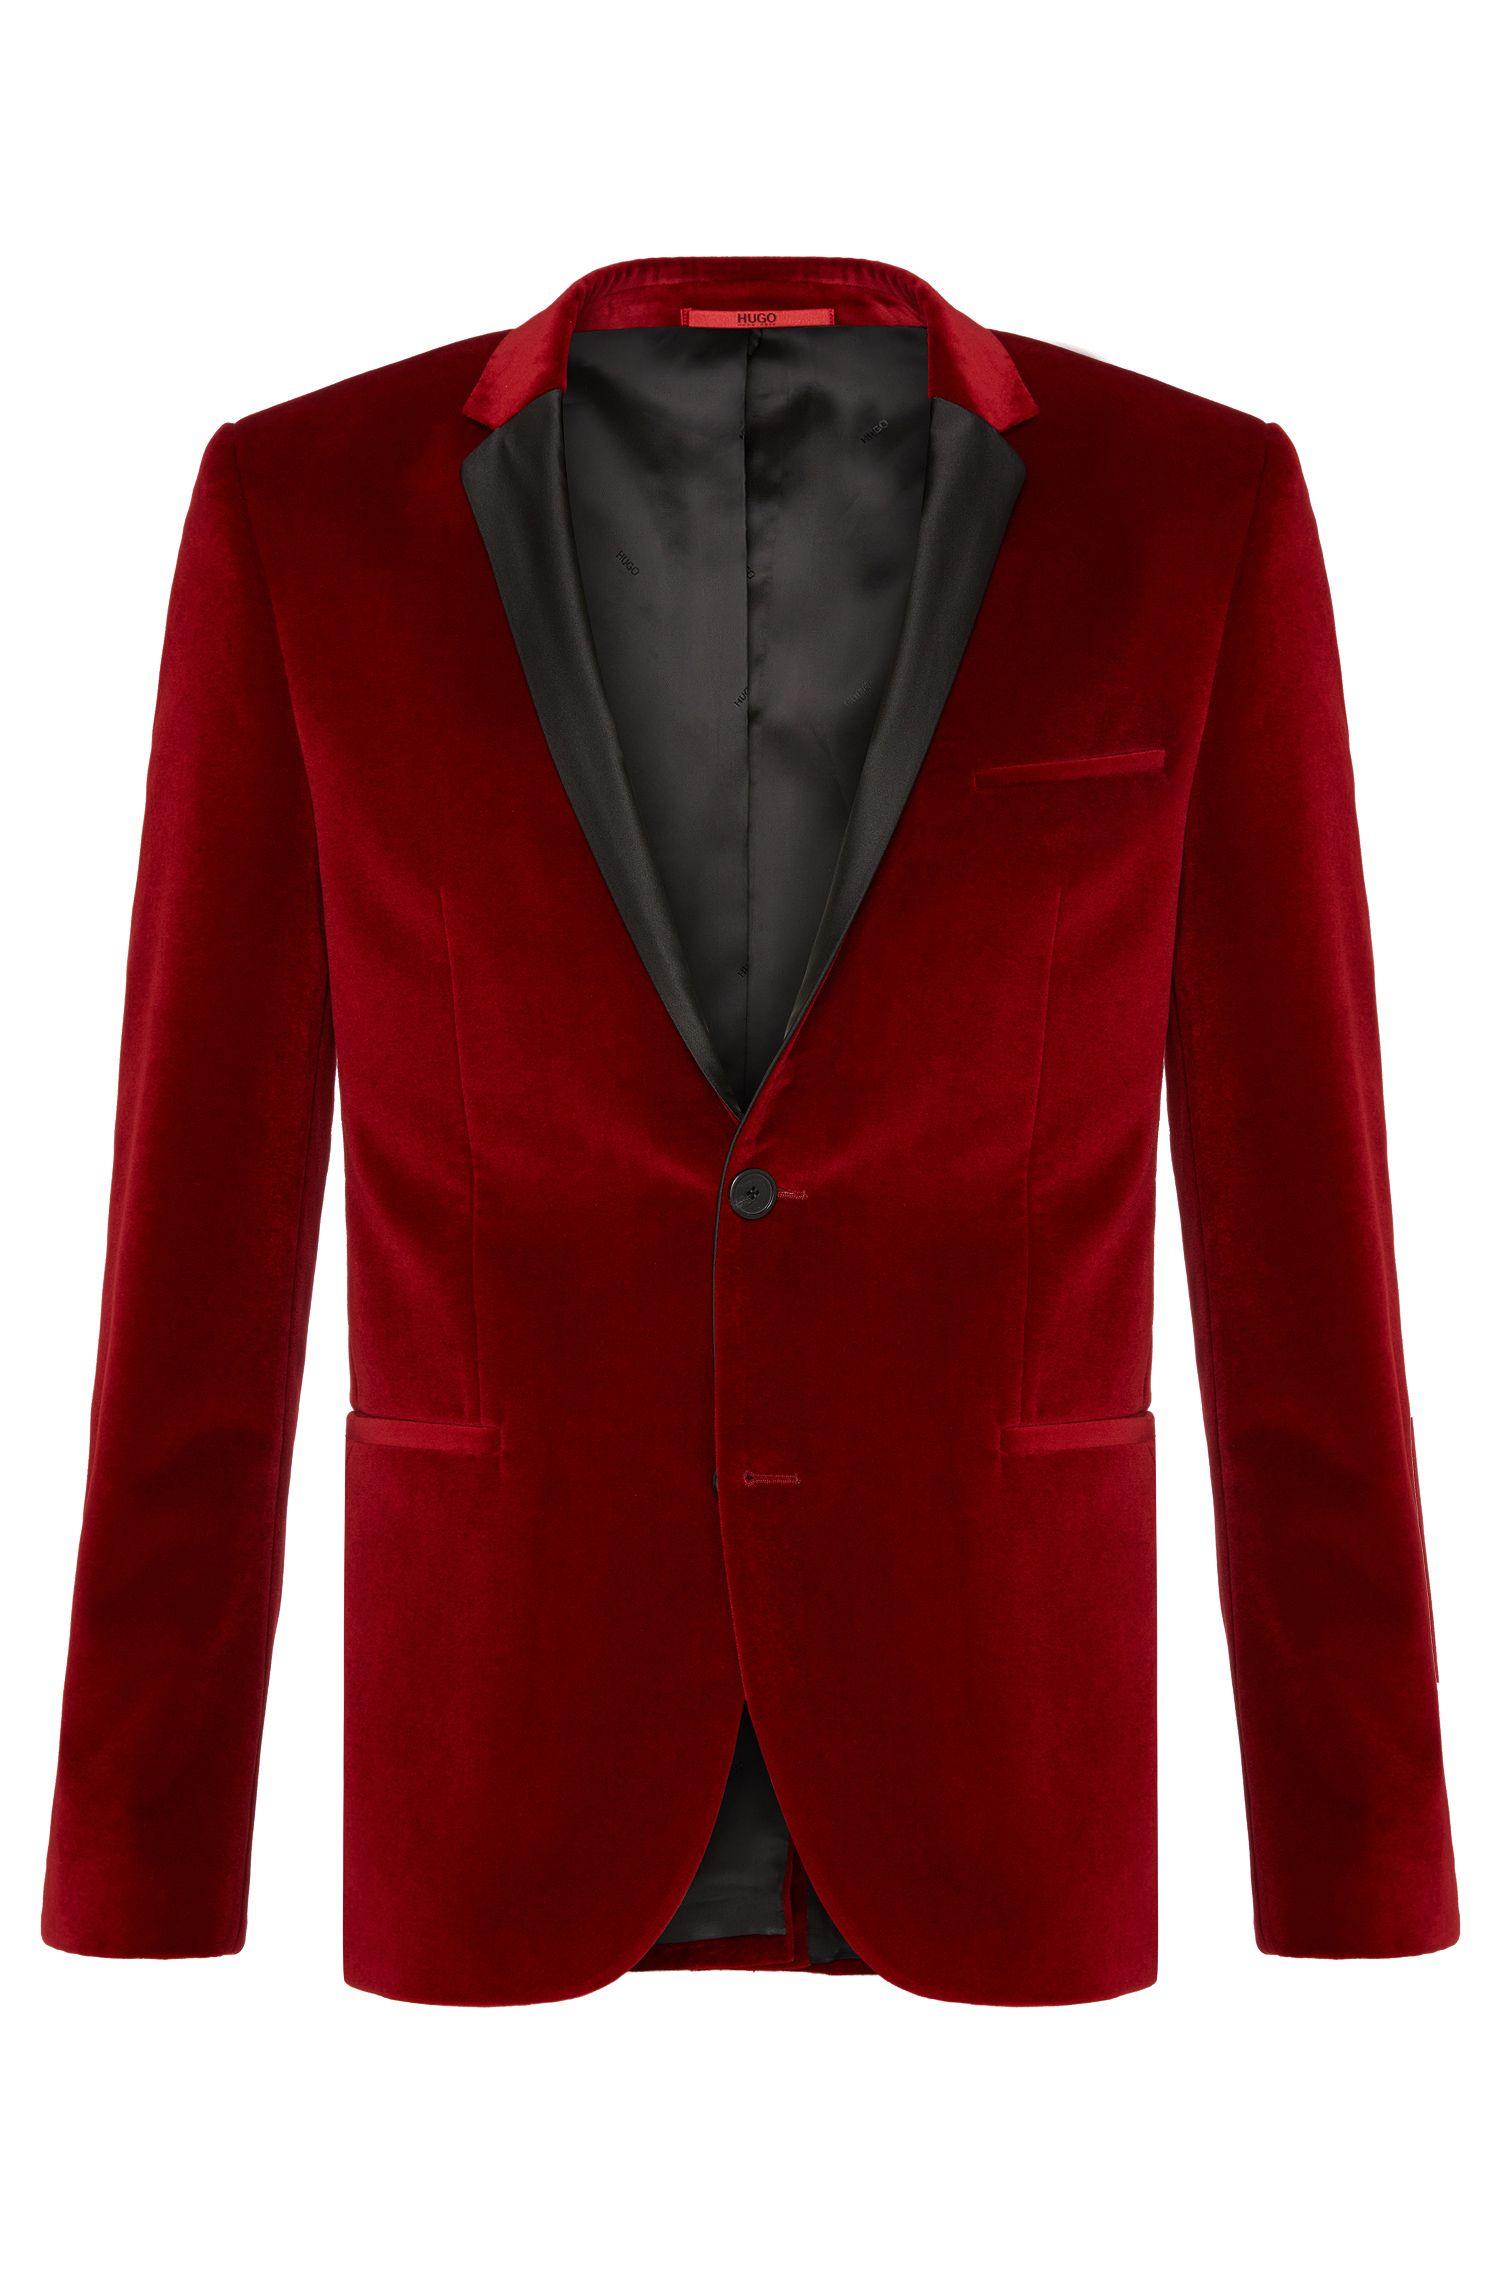 'Adrison' | Extra Slim Fit, Cotton Velvet Sport Jacket